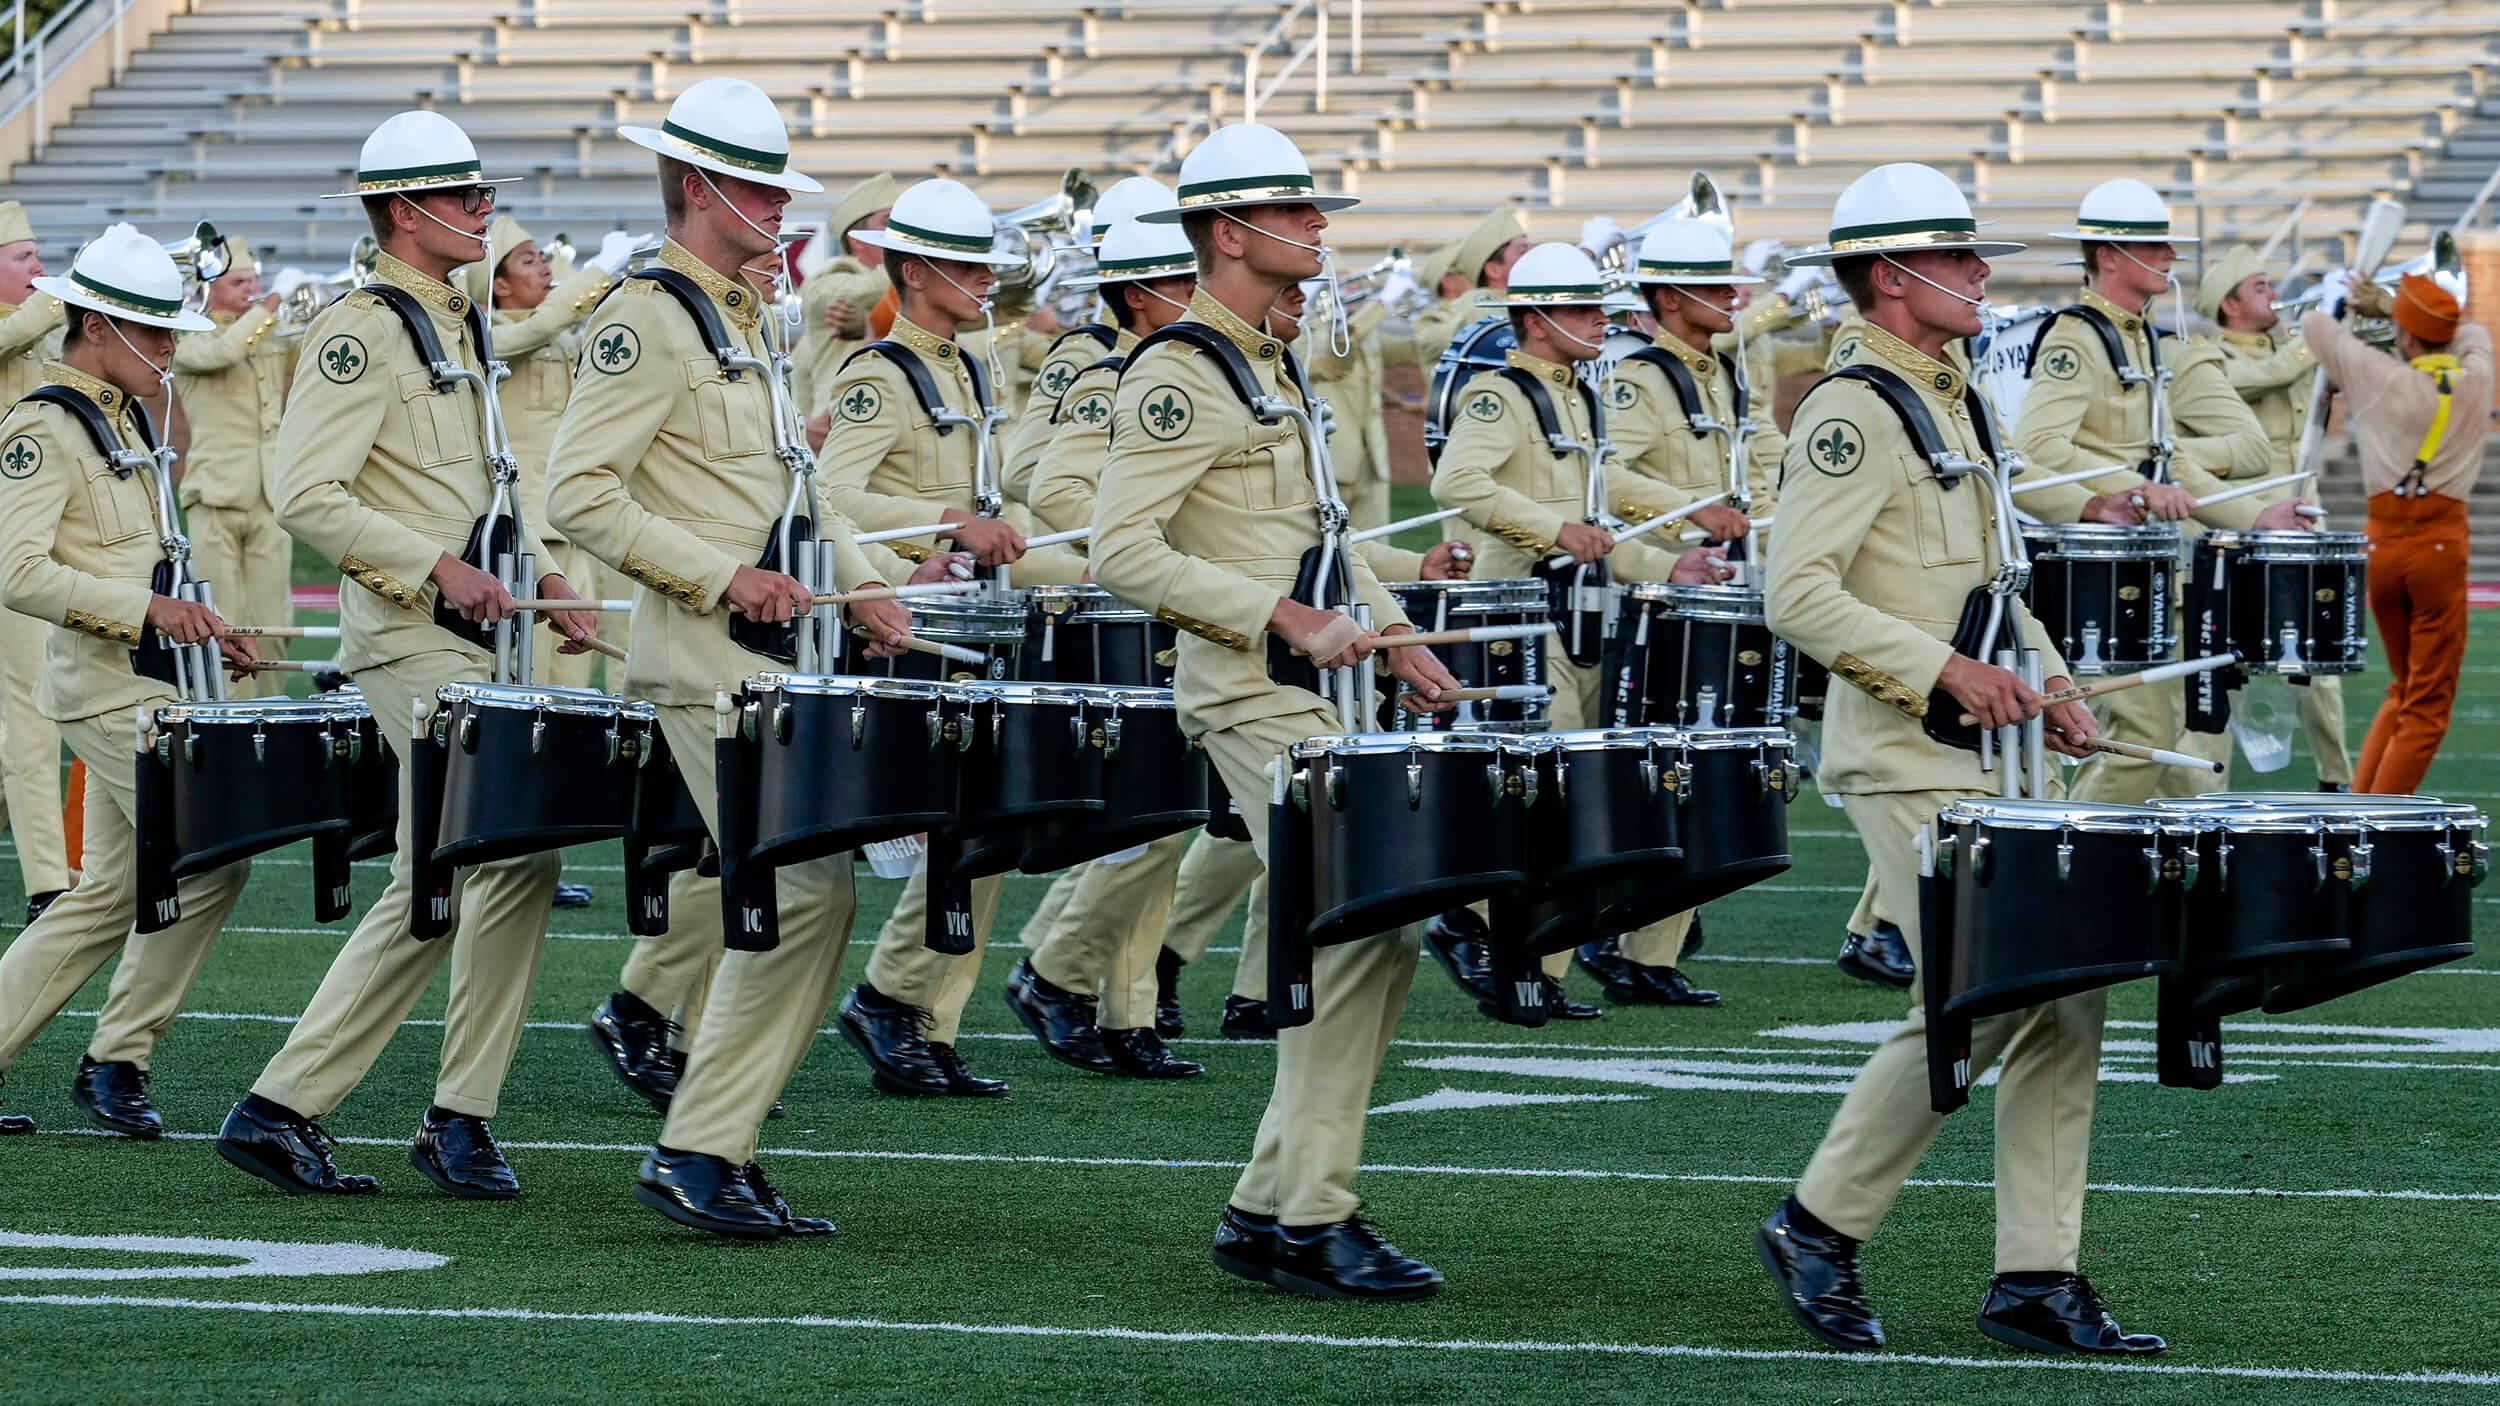 Drums Across Kansas